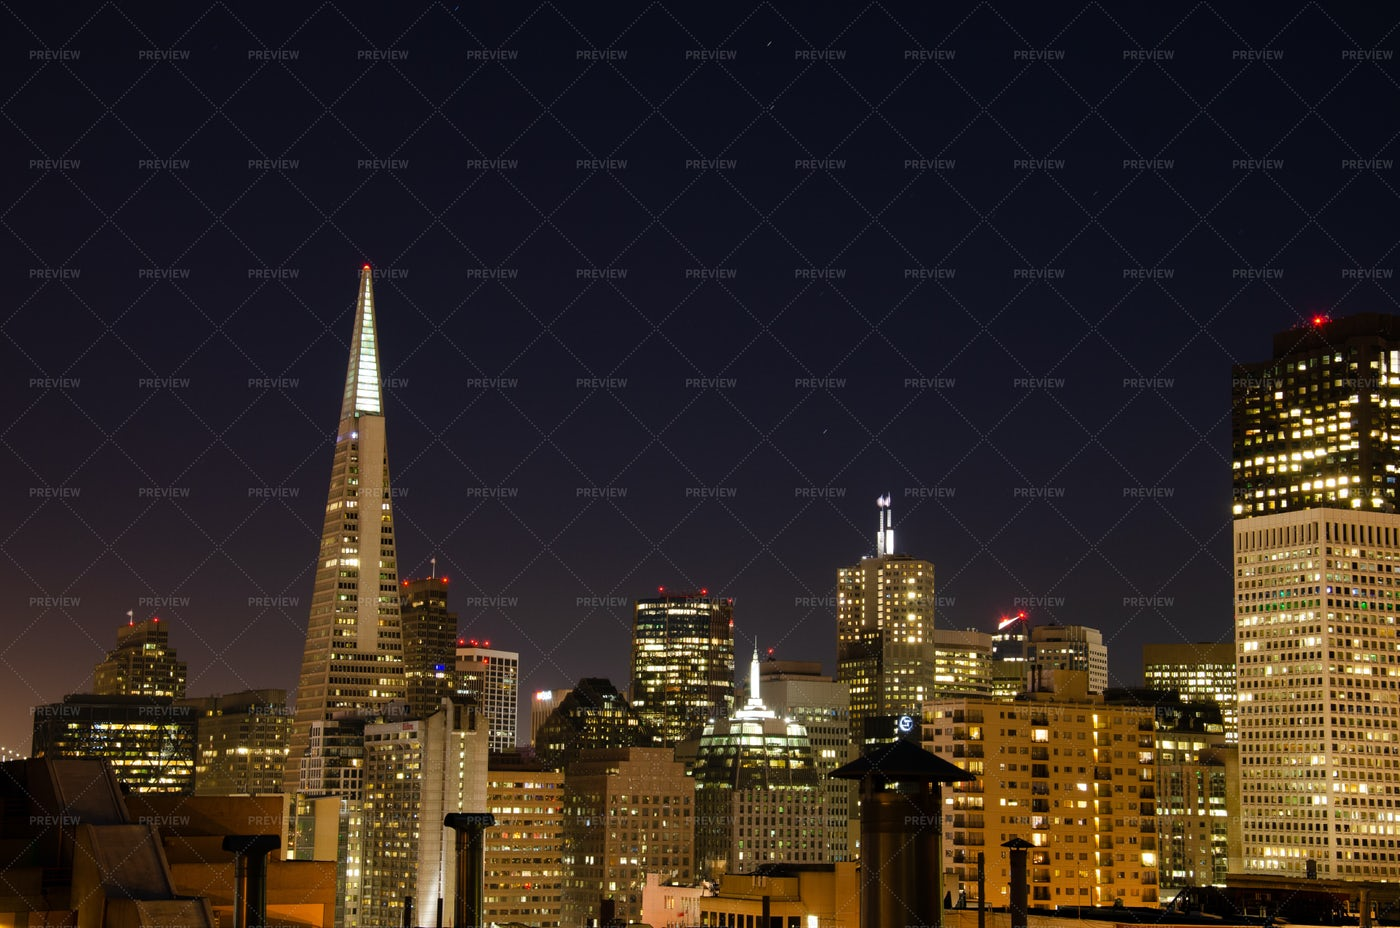 San Francisco Skyline At Night: Stock Photos